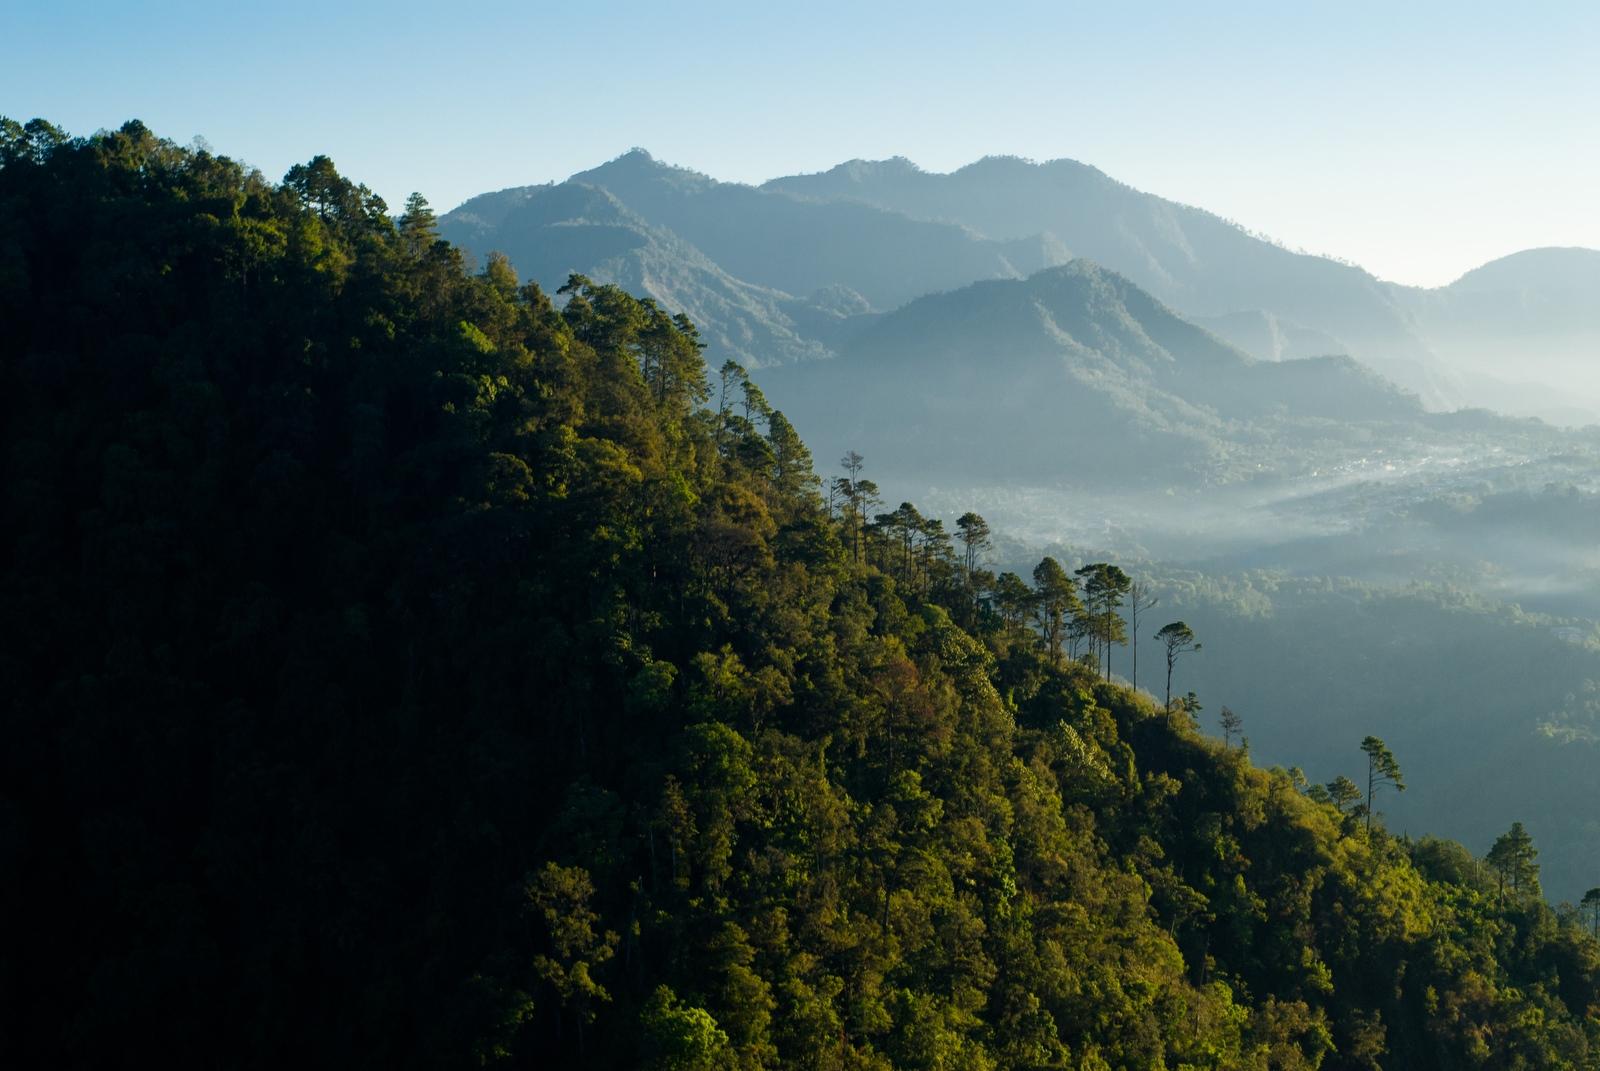 Morning mist shrouds the ridges of mountains surrounding Lake Atitlán, Guatemala.